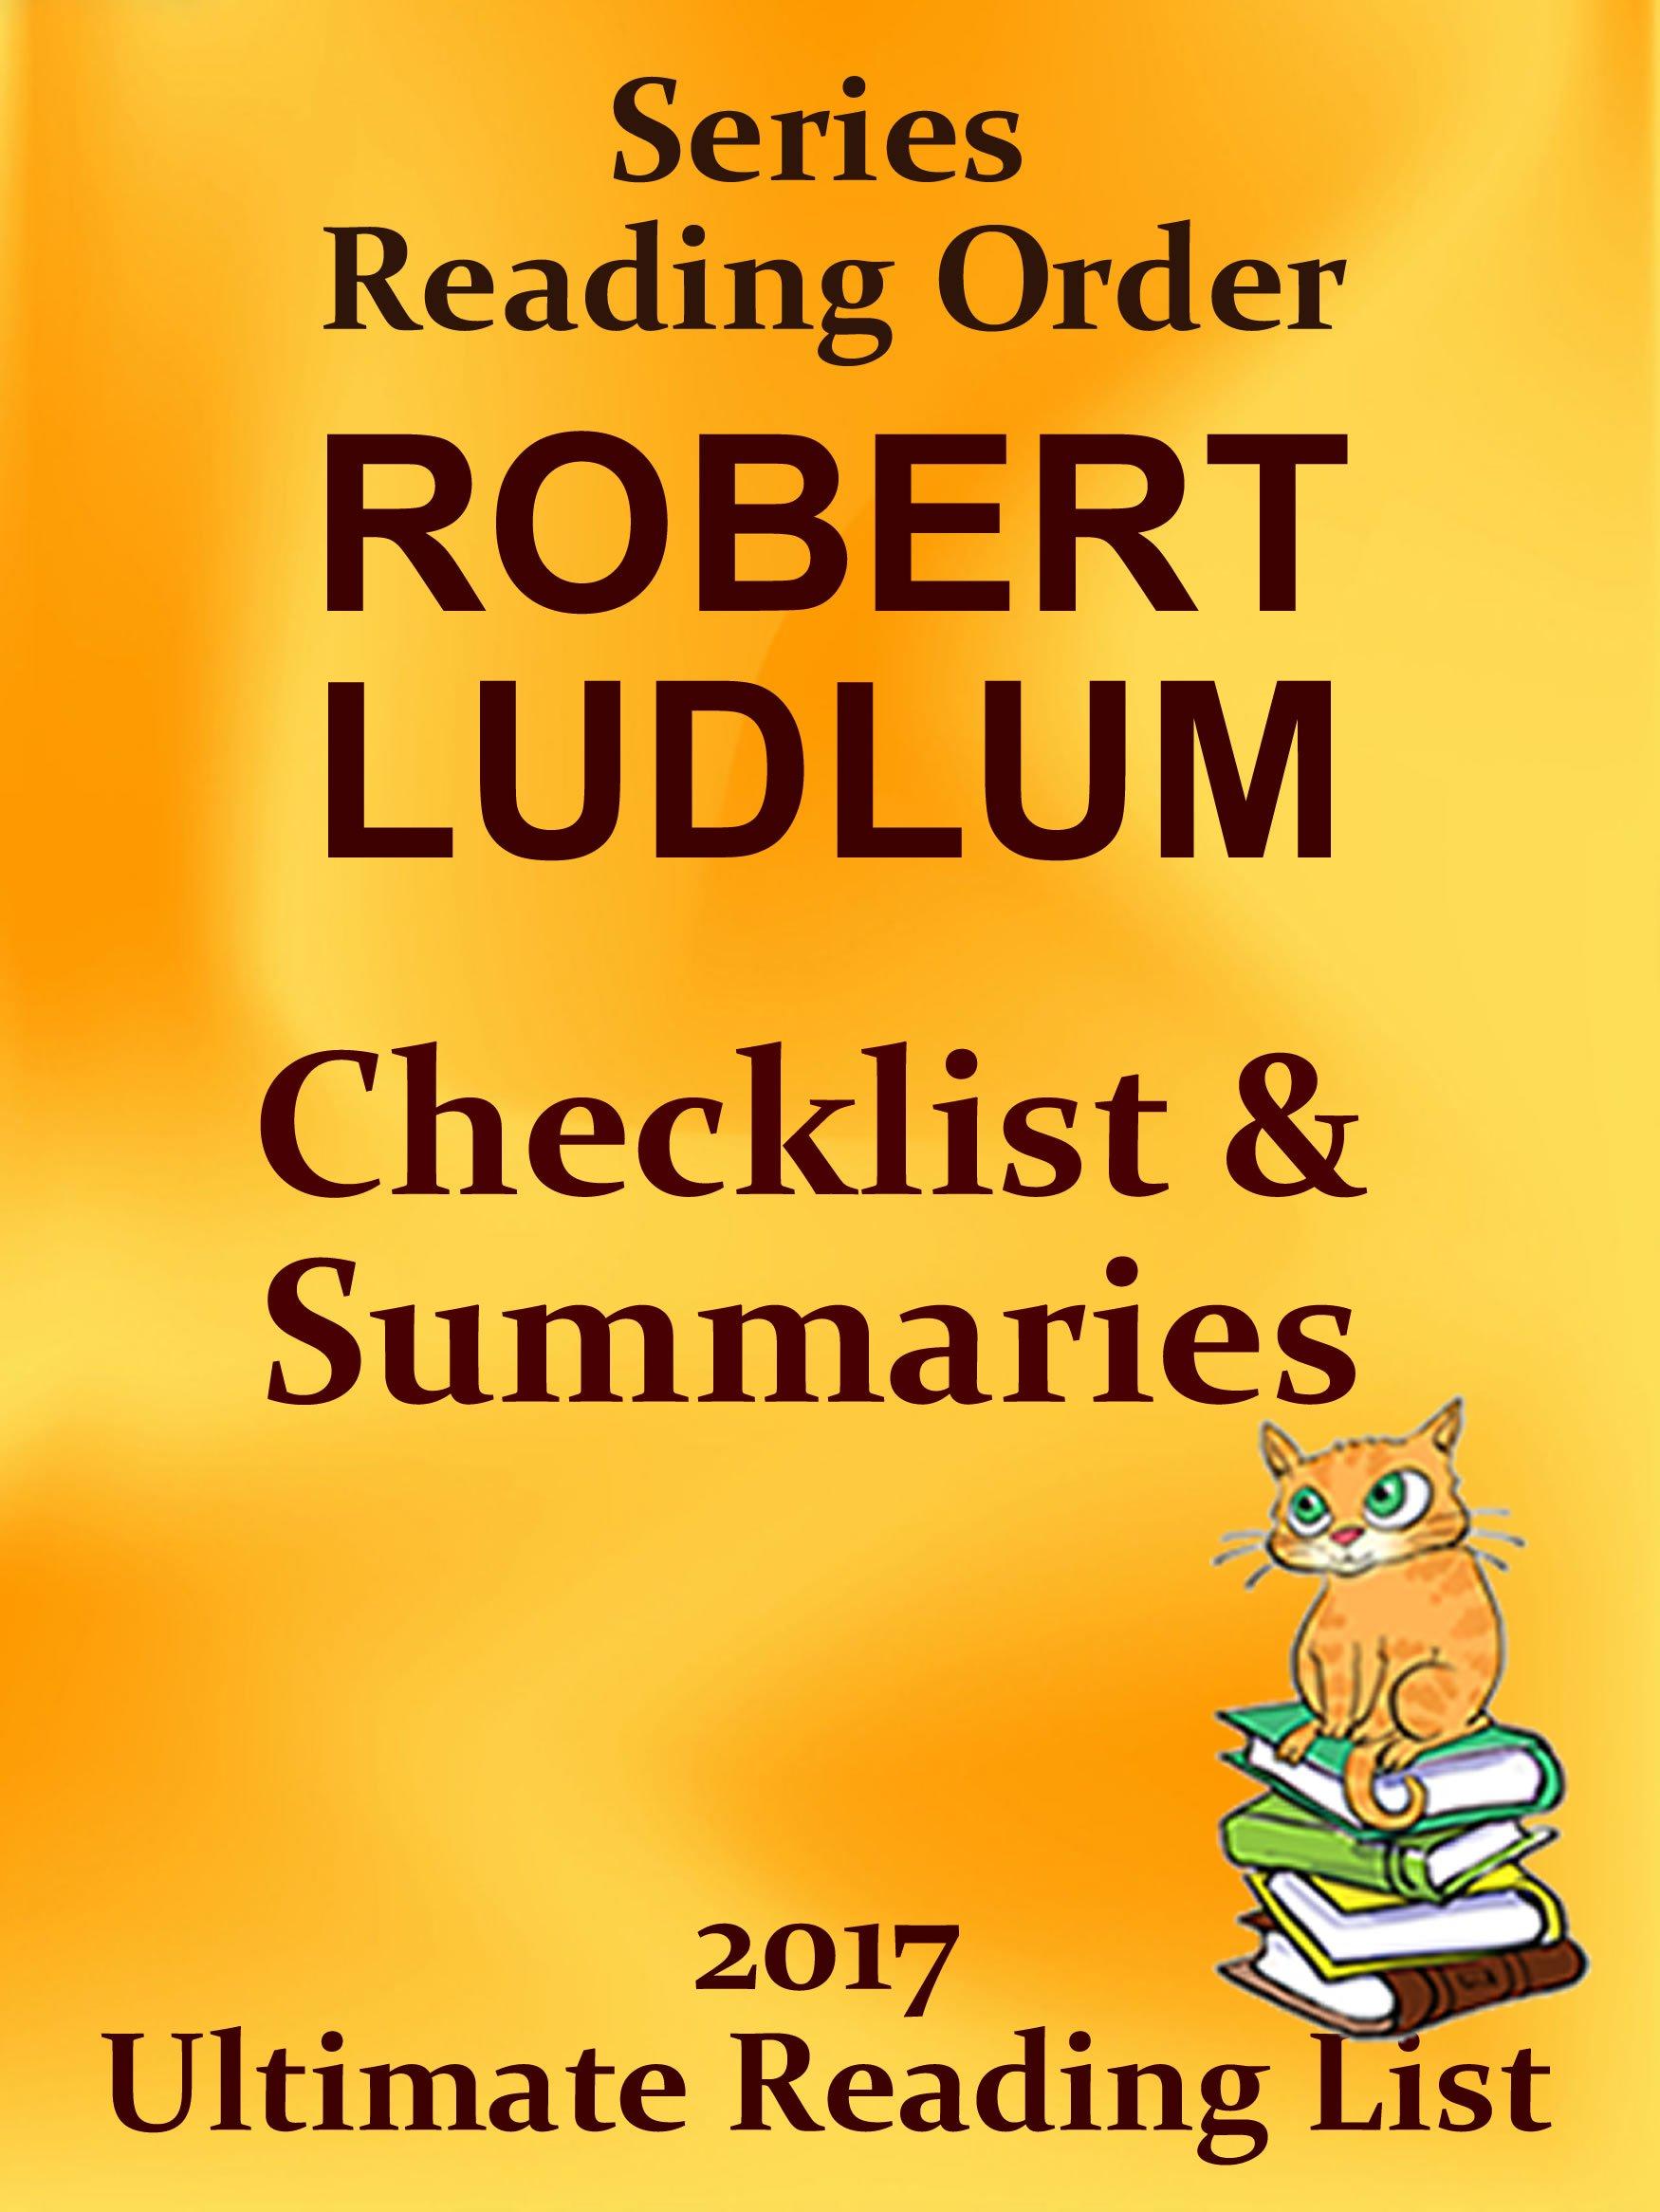 ROBERT LUDLUM BOOKS CHECKLIST AND SUMMARIES - UPDATED 2017: READING LIST, READER CHECKLIST FOR ALL ROBERT LUDLUM'S BOOKS (Ultimate Reading List Book 36)